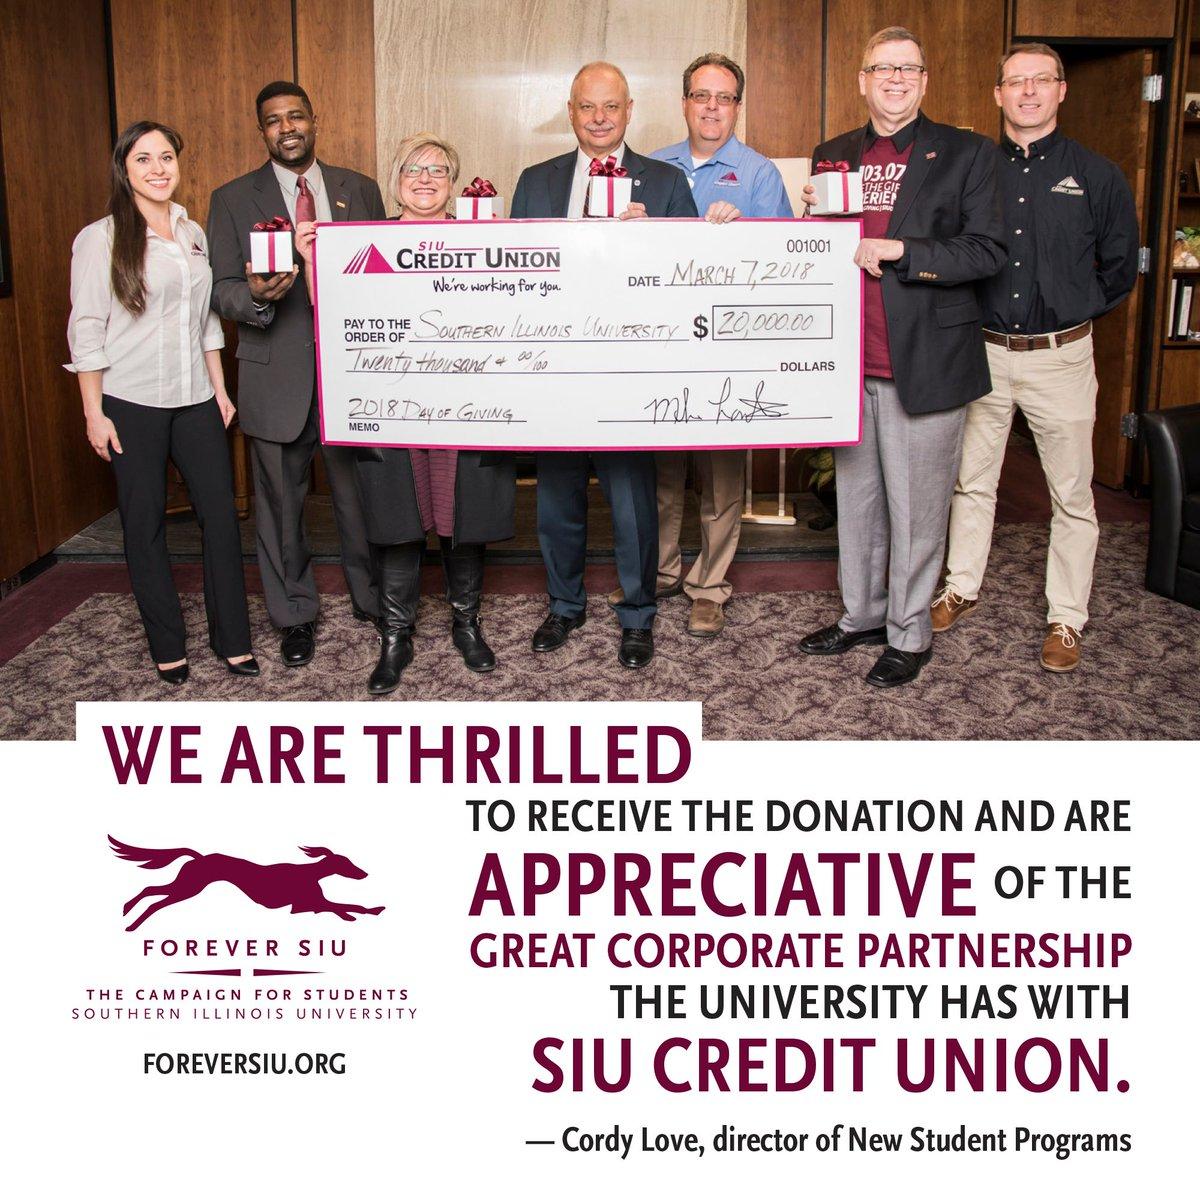 SIU Foundation on Twitter: